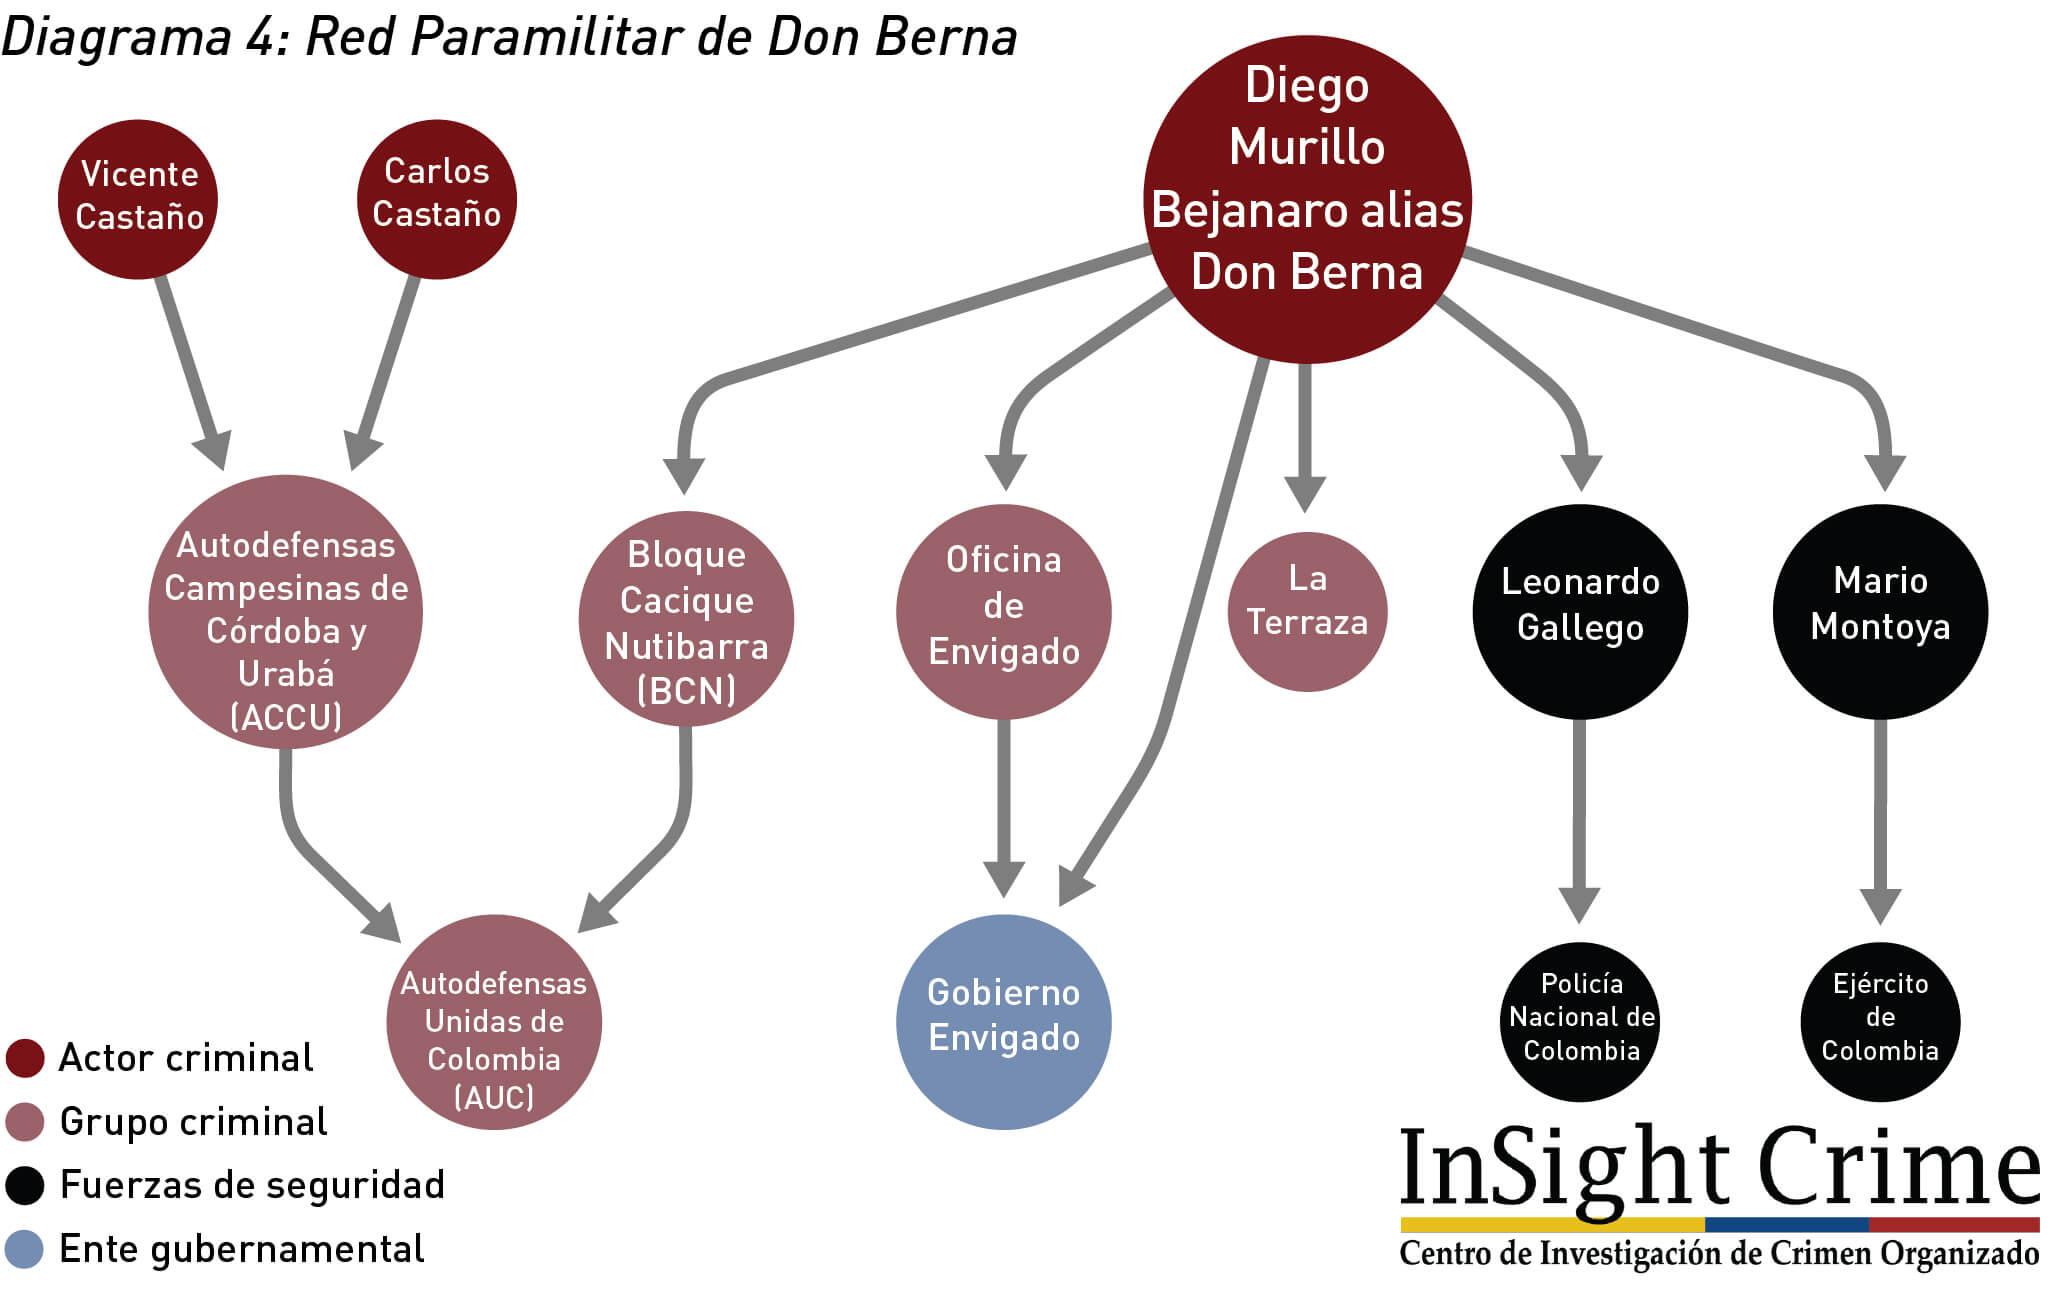 Diagrama4 DonBernaParamilitaryNetwork